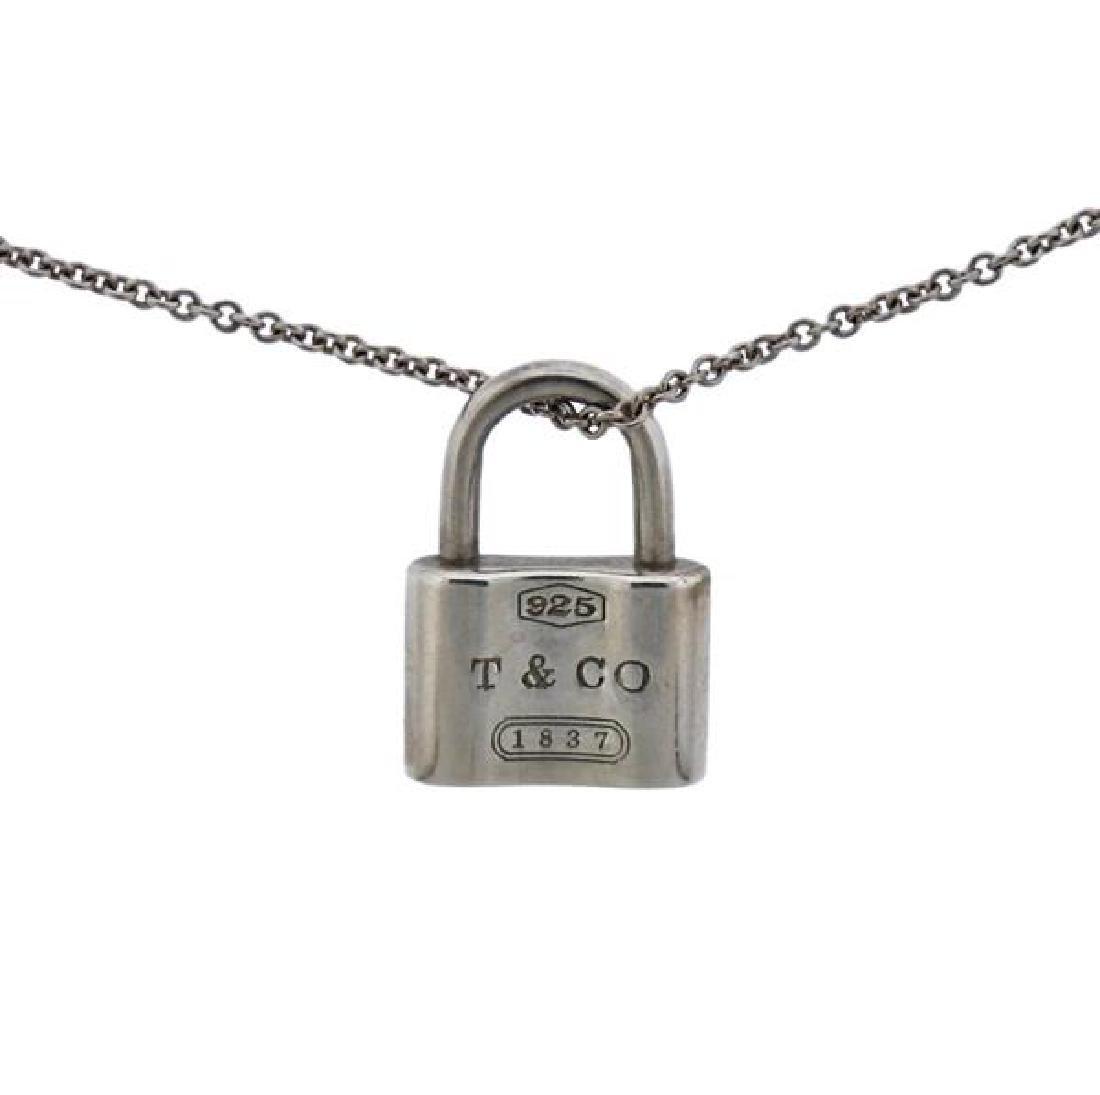 Tiffany & Co 1837 Sterling Silver Padlock Pendant - 2